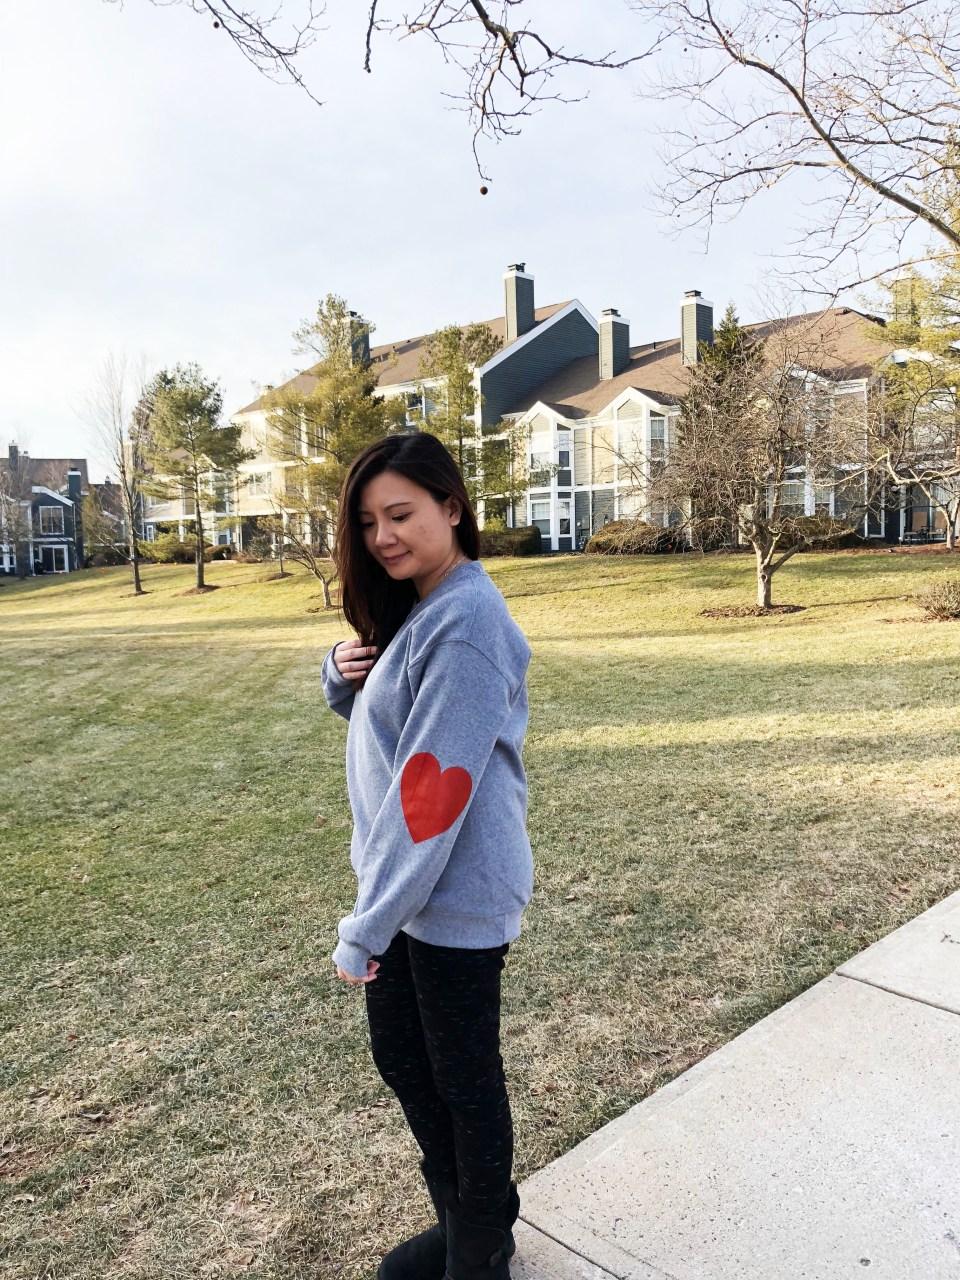 Elbow Heart Sweatshirt 3